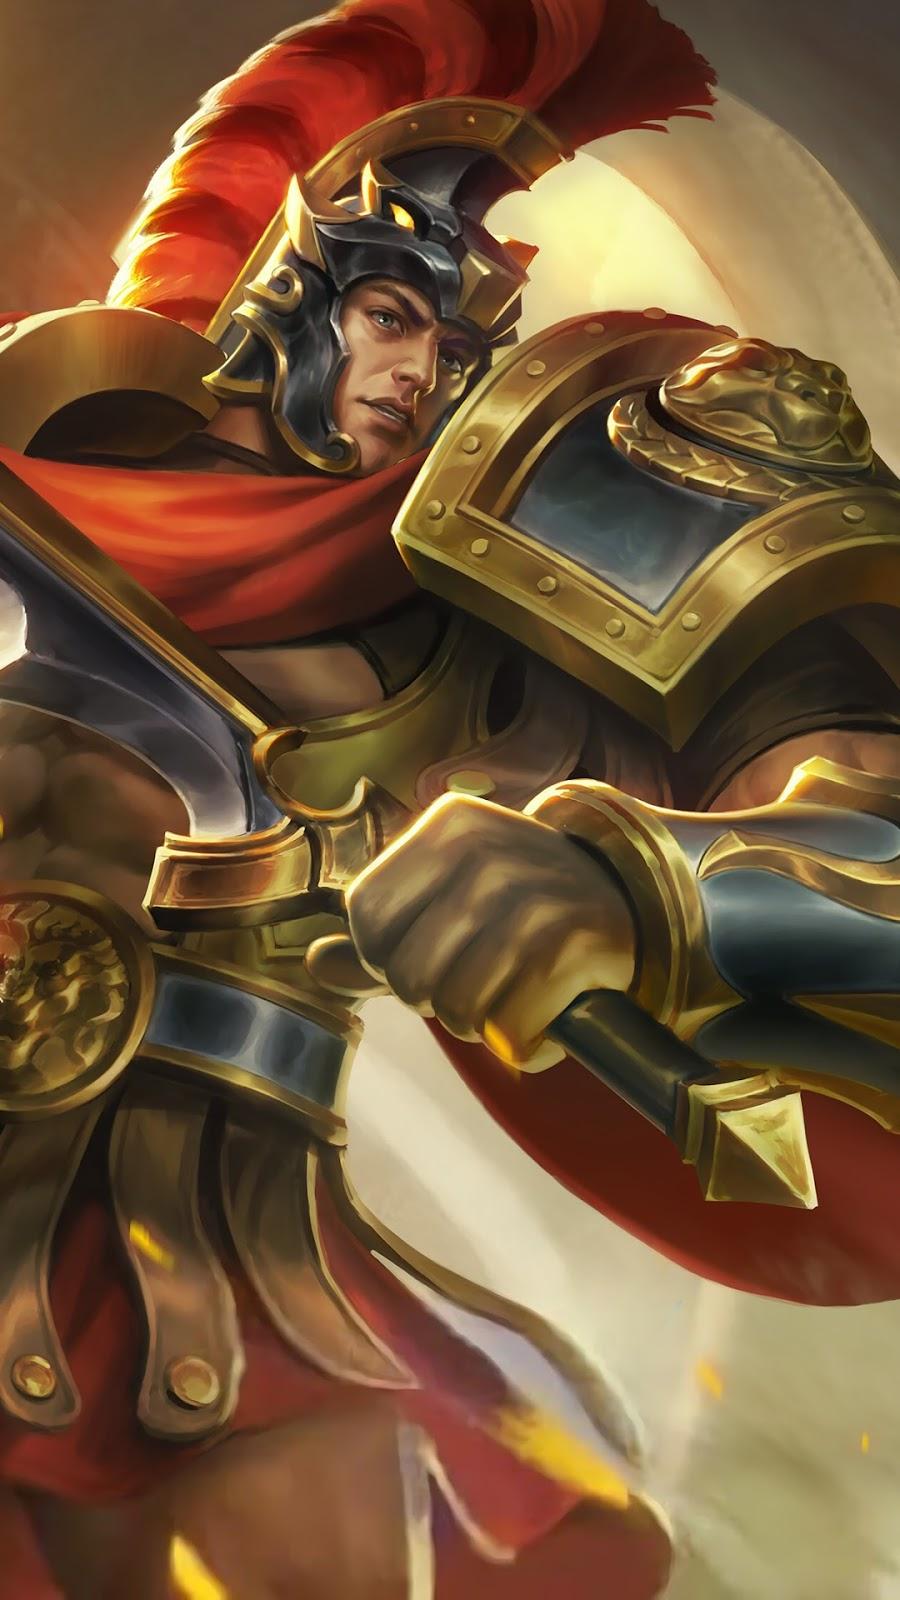 Wallpaper Lapu-Lapu Imperial Champion Skin Mobile Legends HD for Mobile